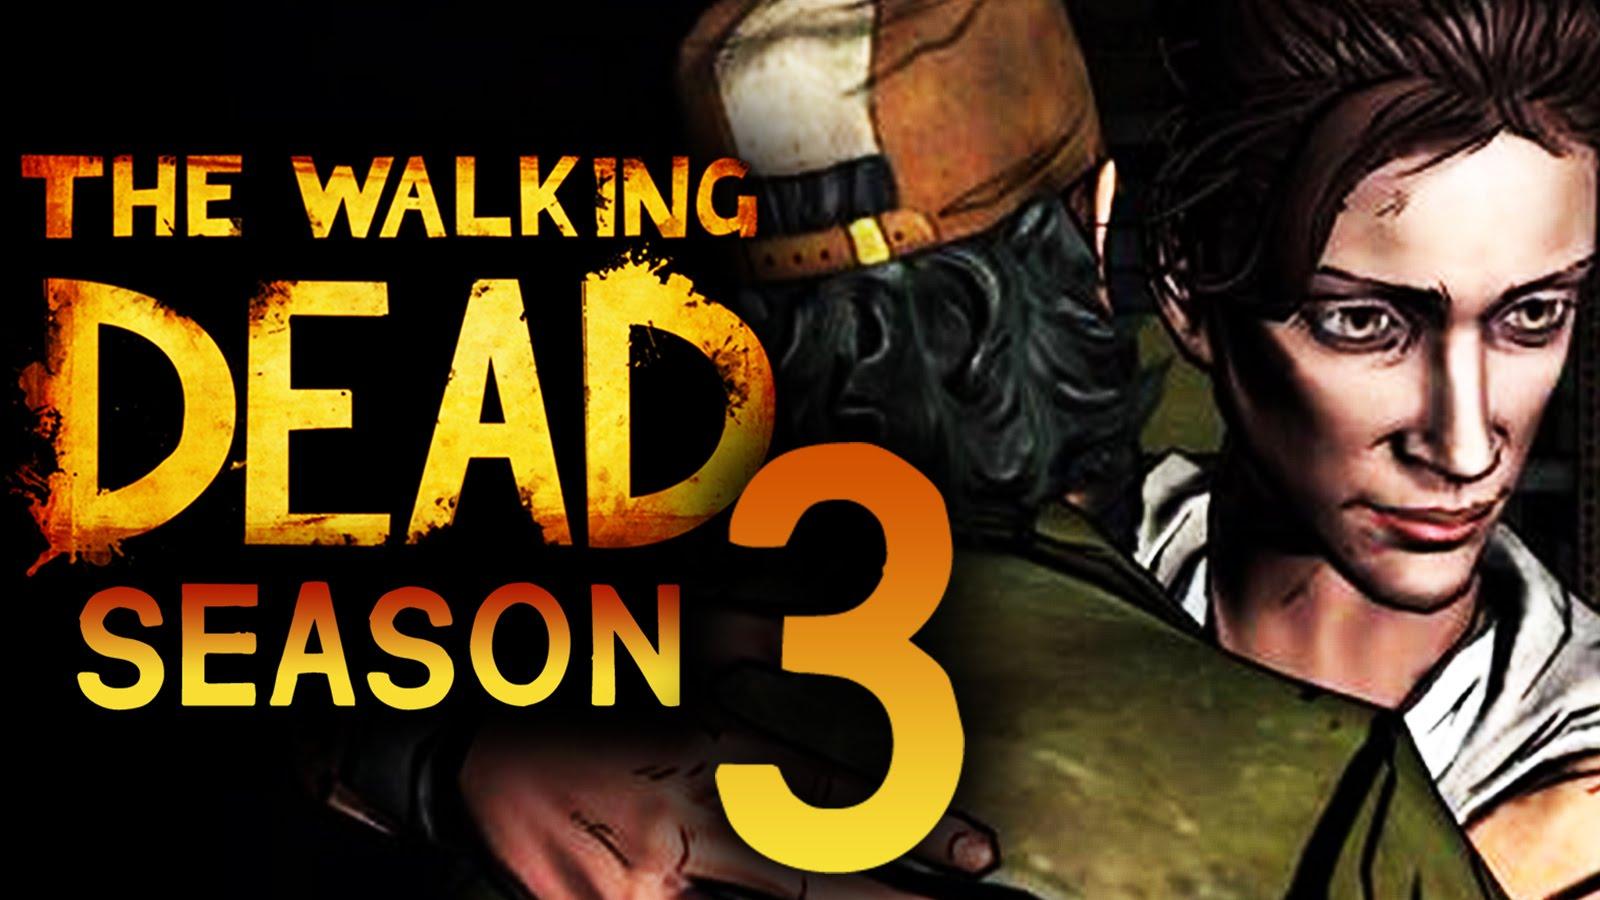 'The Walking Dead' Third Season Teaser Revealed at E3